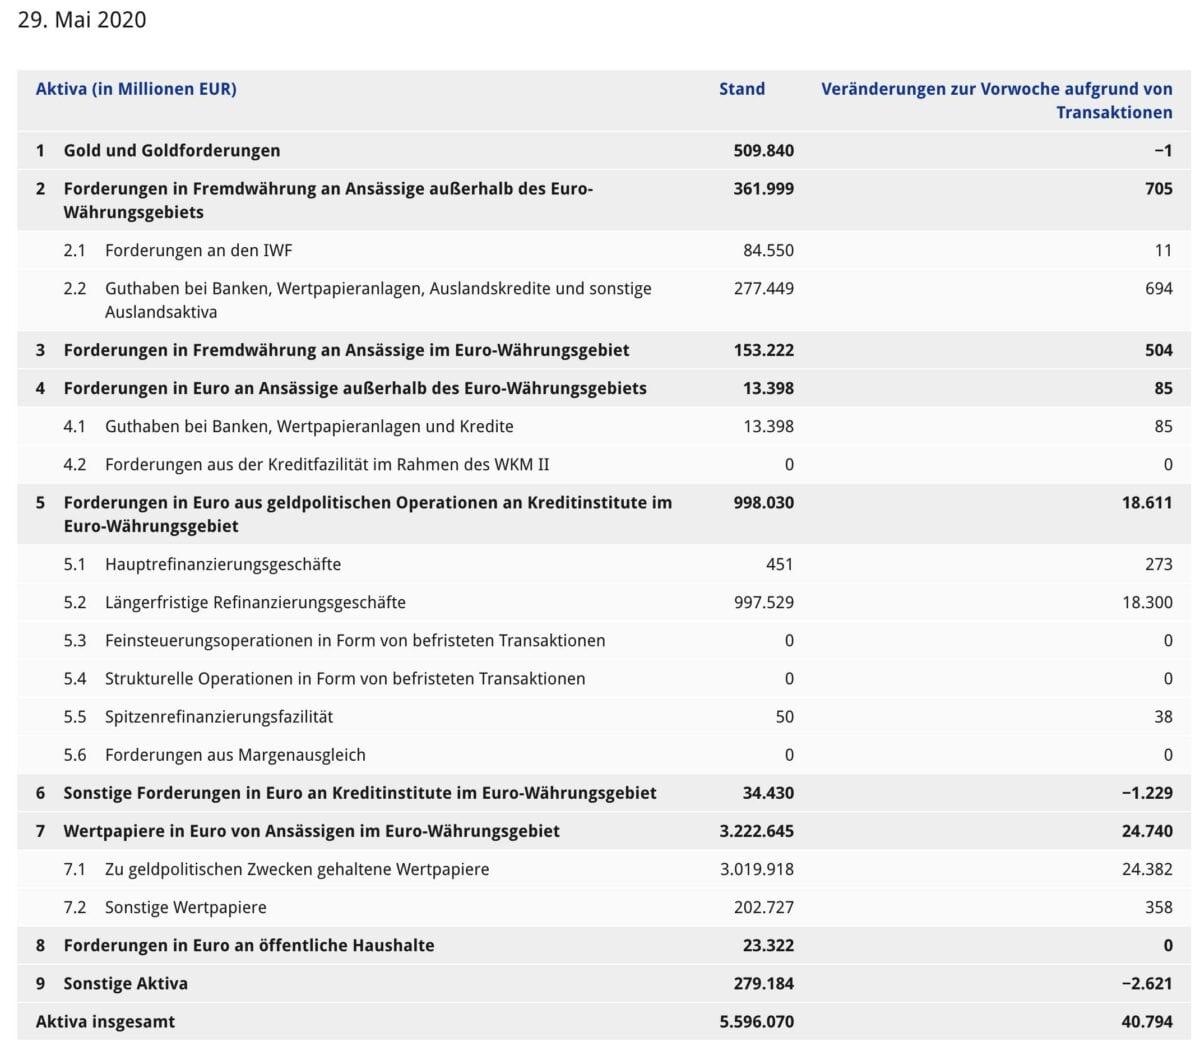 EZB-Bilanz mit Stand 29. Mai